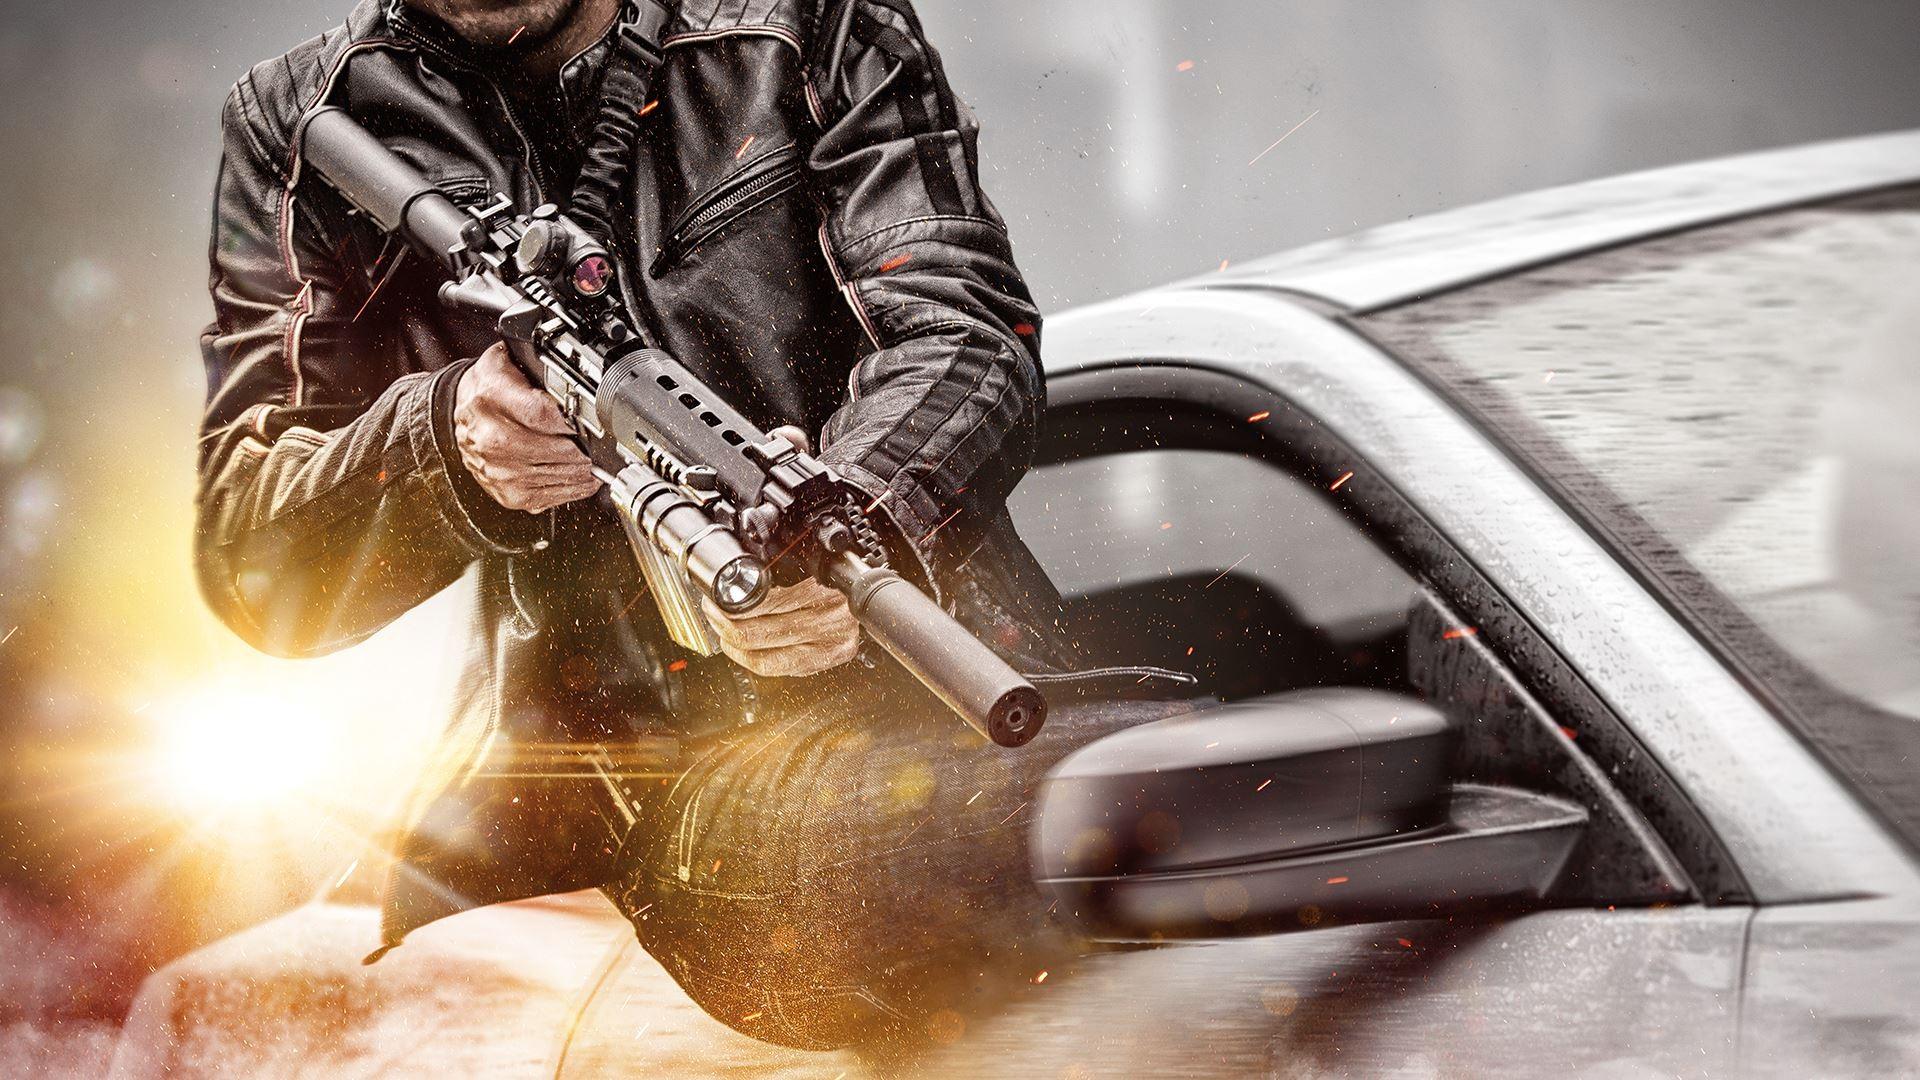 Wallpaper Motorcycle Vehicle Battlefield Hardline